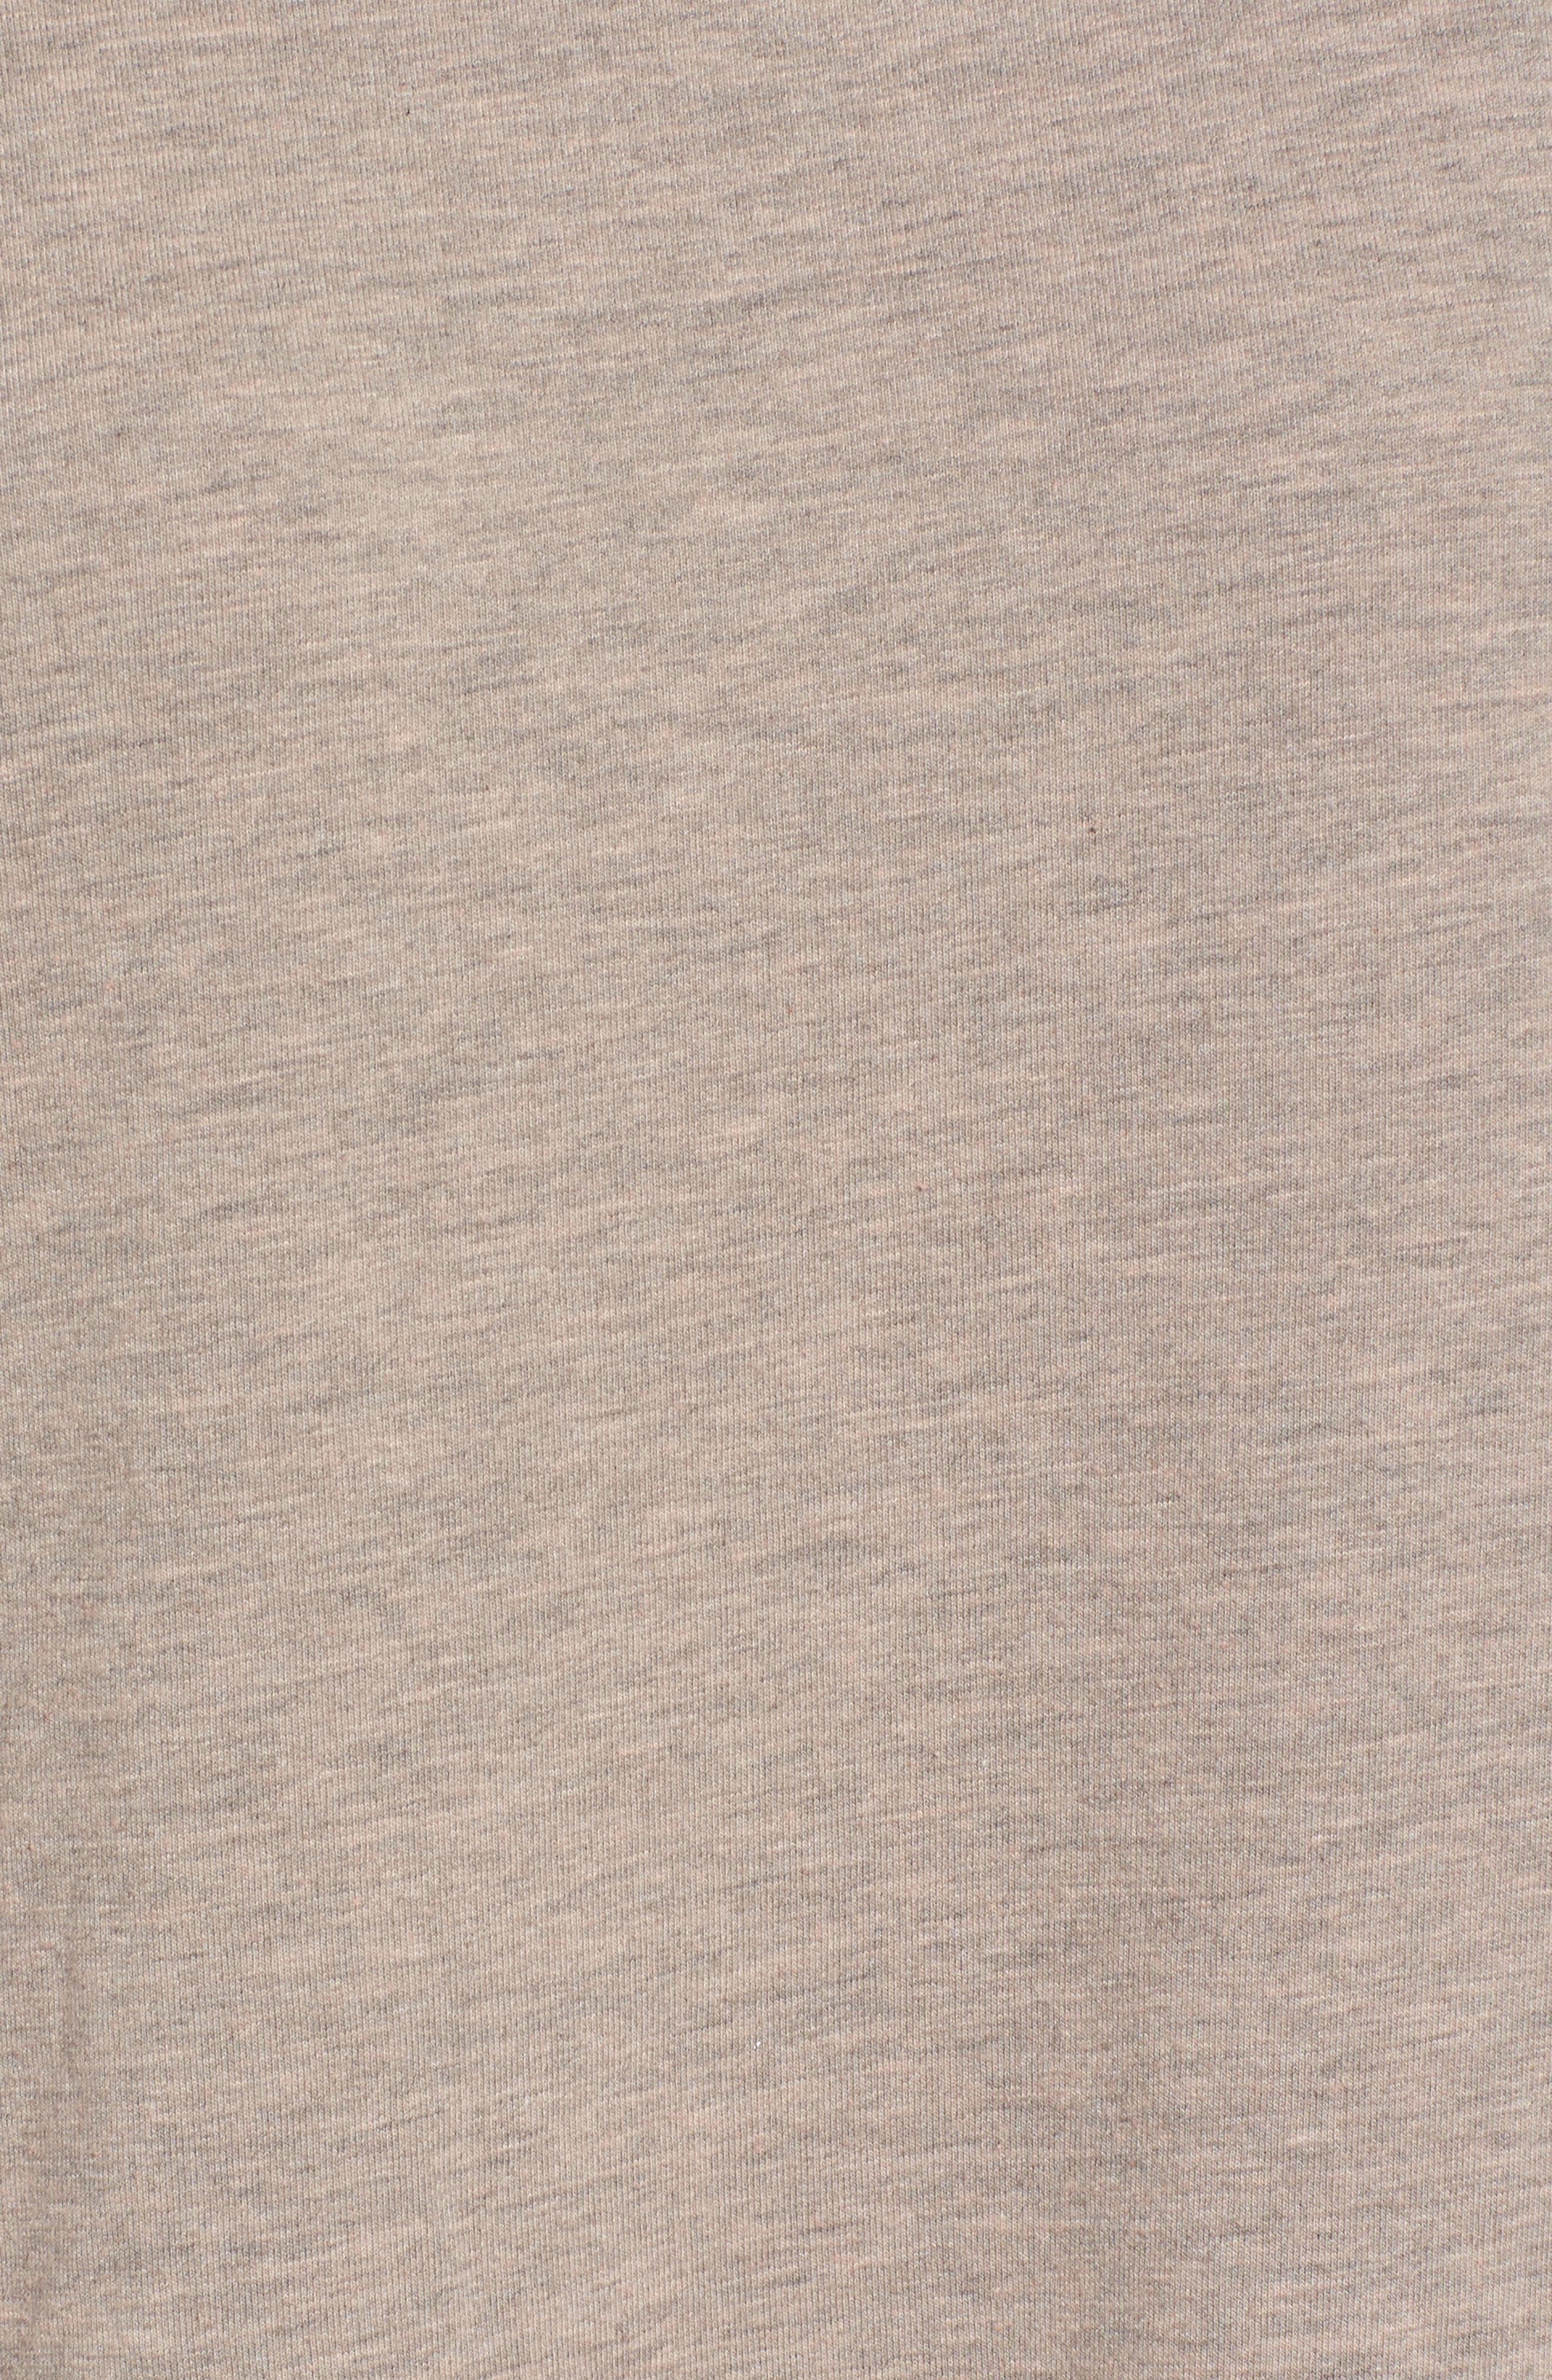 Low Back Sweatshirt Dress,                             Alternate thumbnail 5, color,                             650